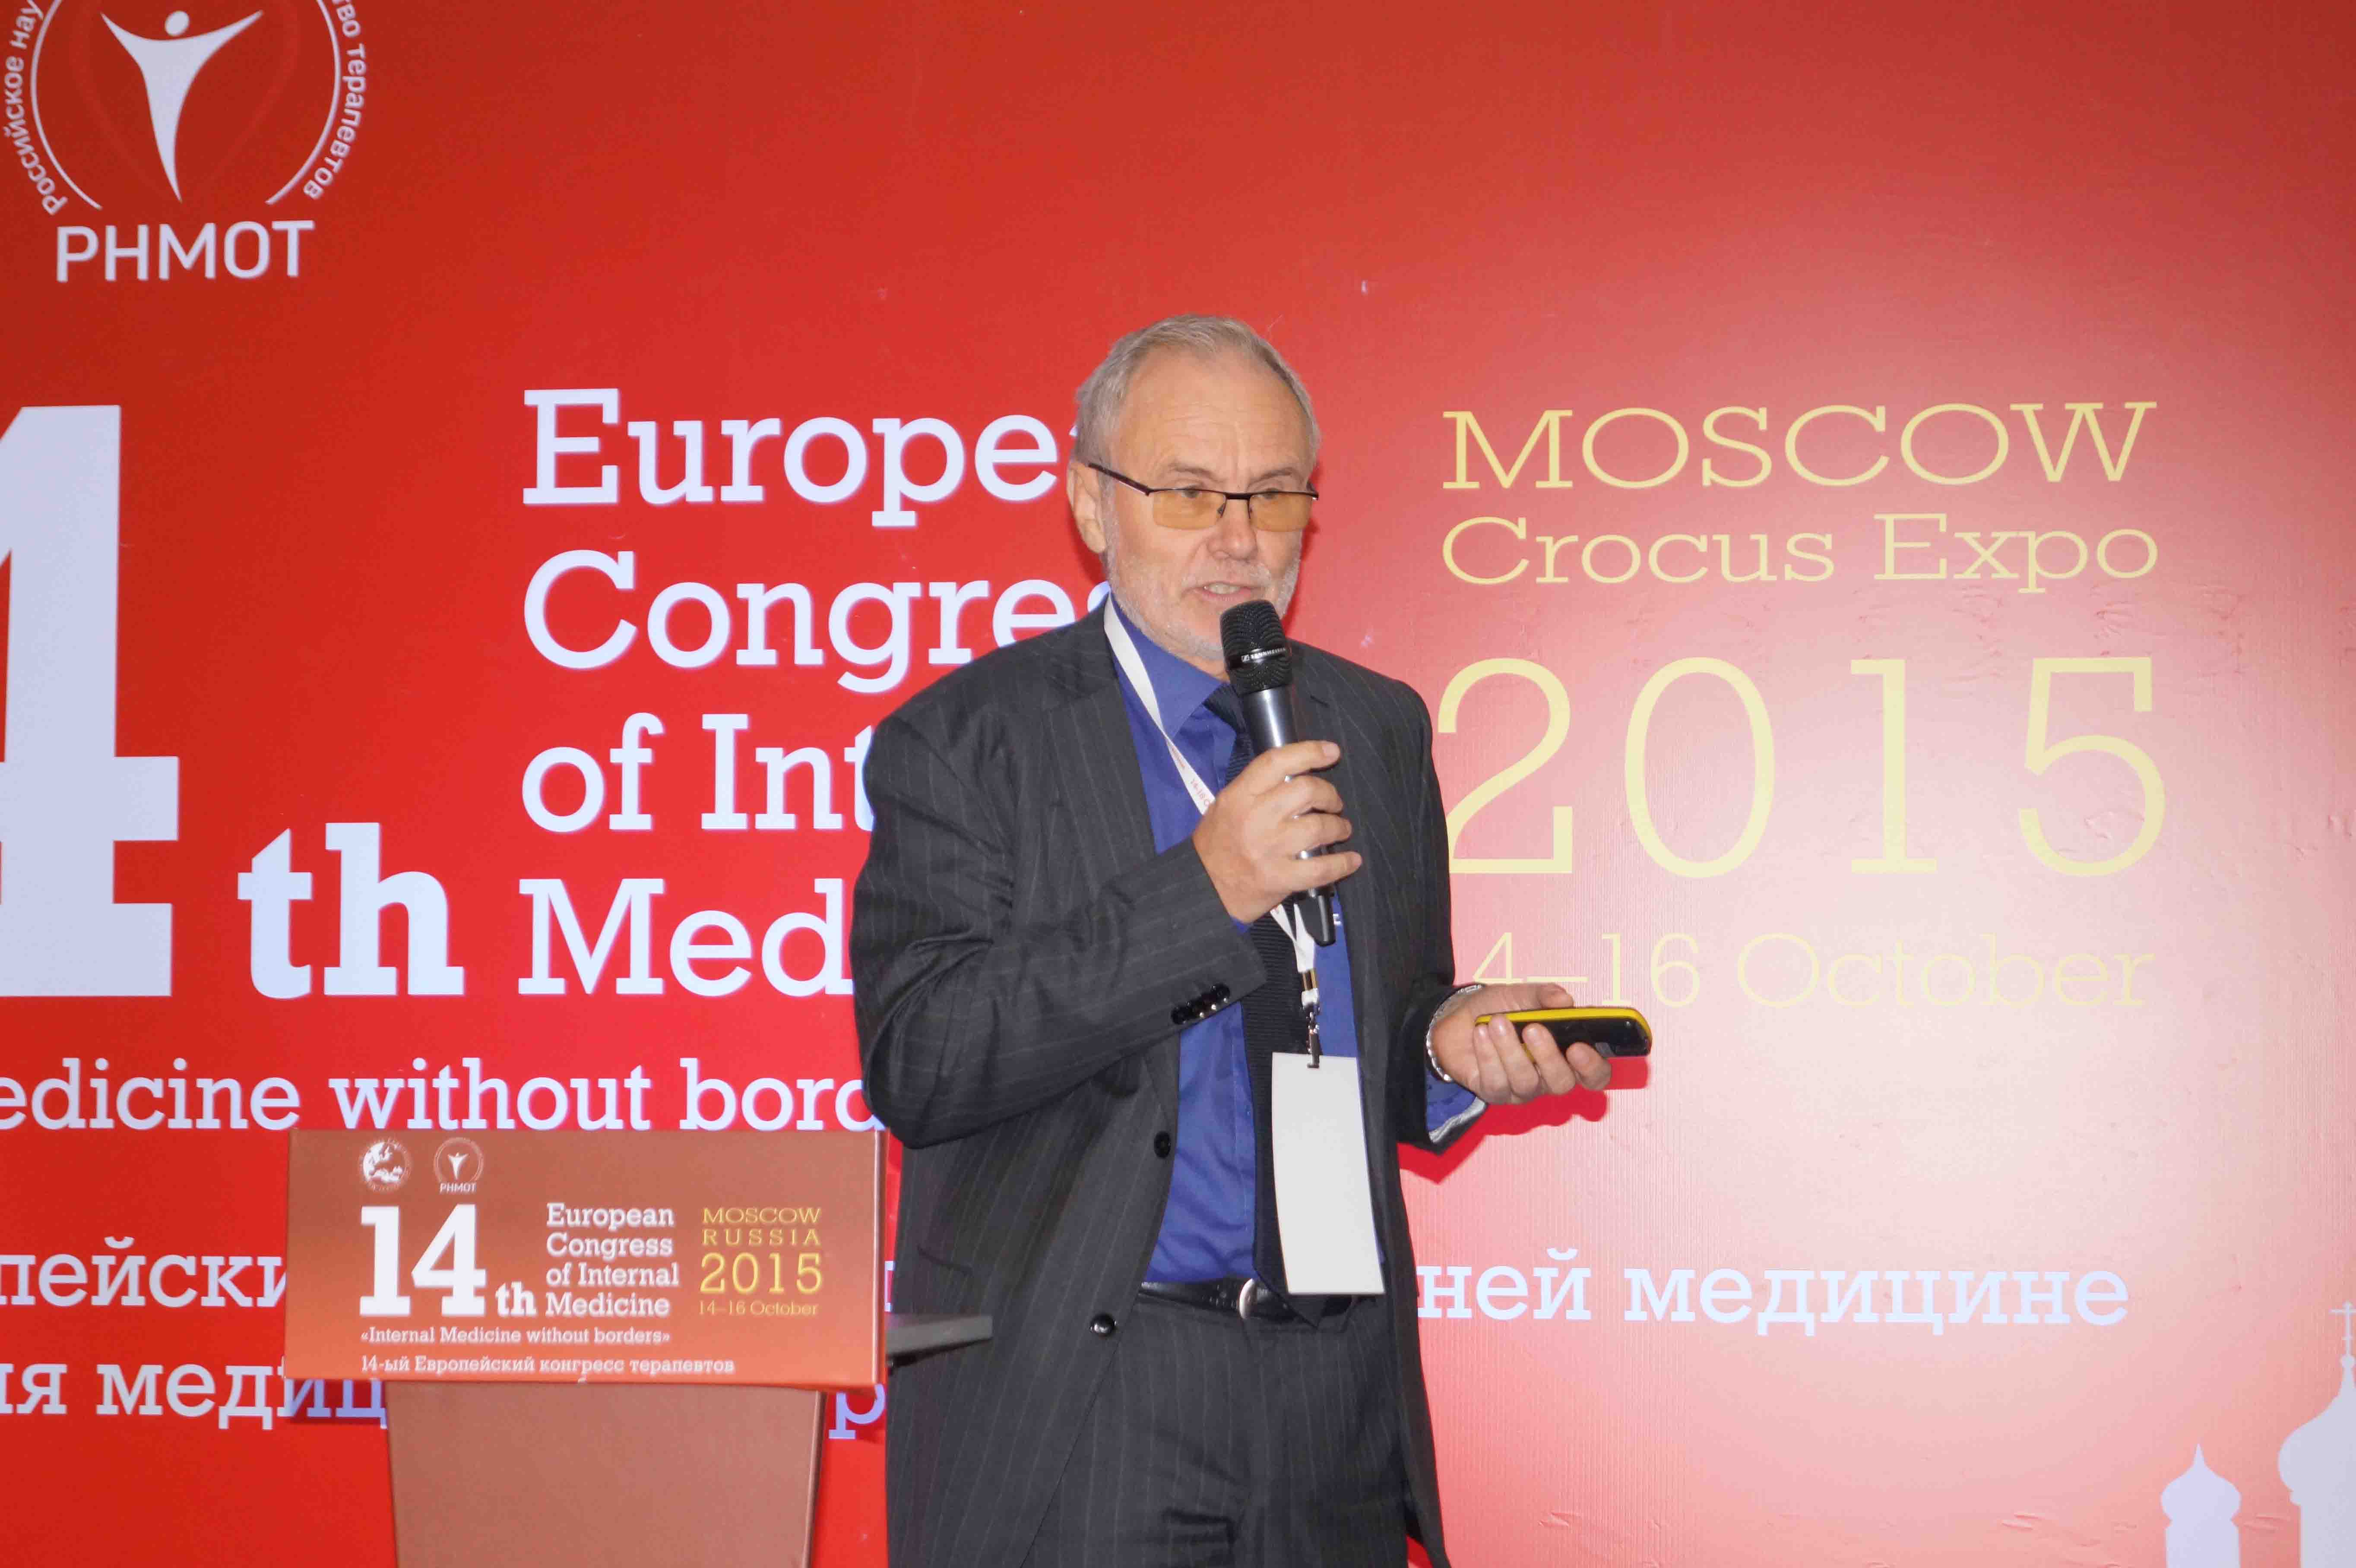 http://medicalexpress.ru/uploads/reportss/DSC02832.jpg